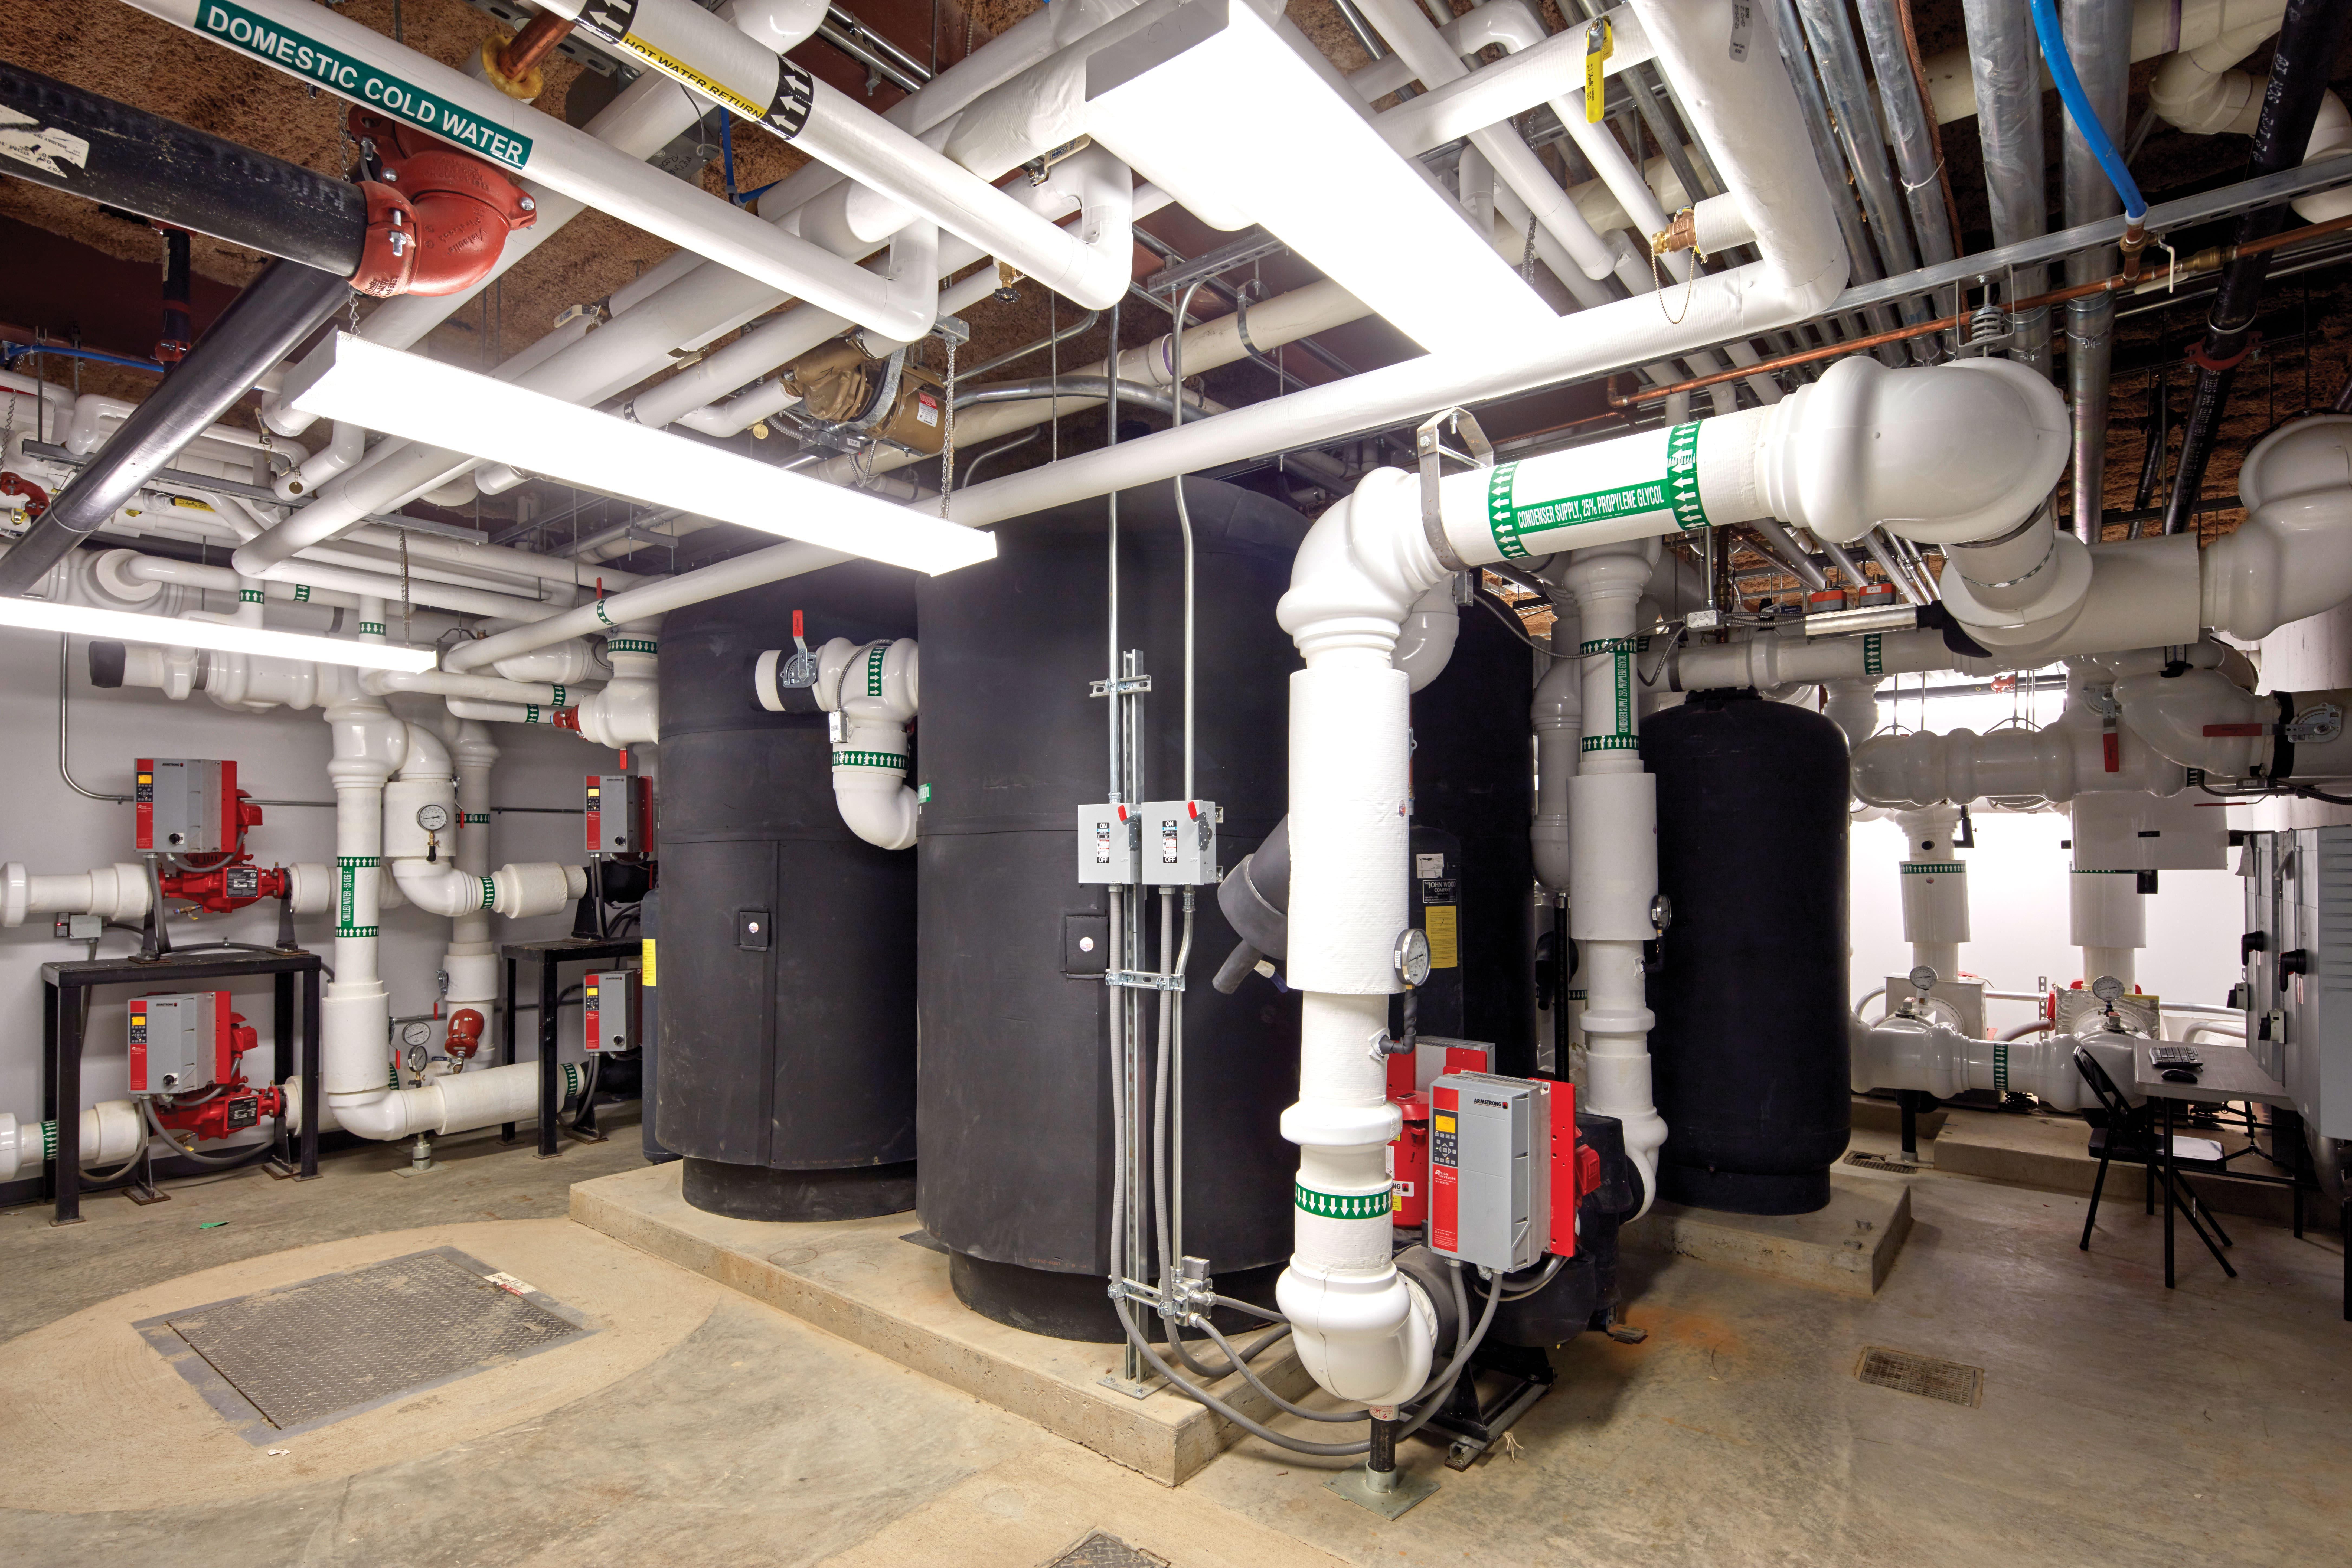 Messana Radiant Cooling, Chatham University, hydronic radiant cooling panels